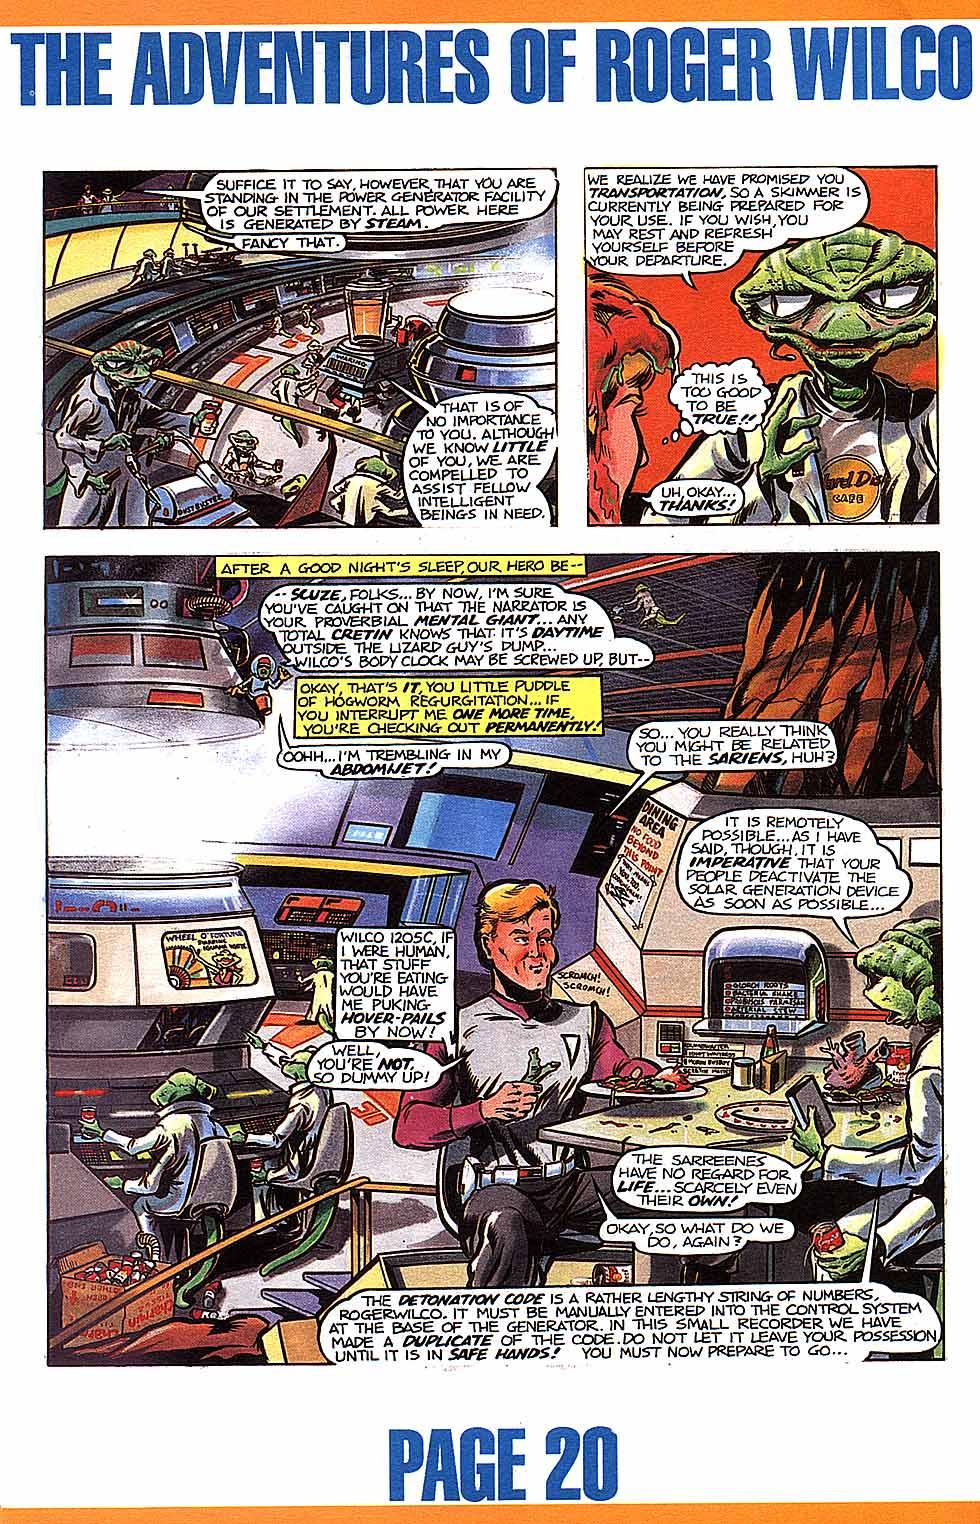 SpaceQuest.Net - Roger Wilco Comics on